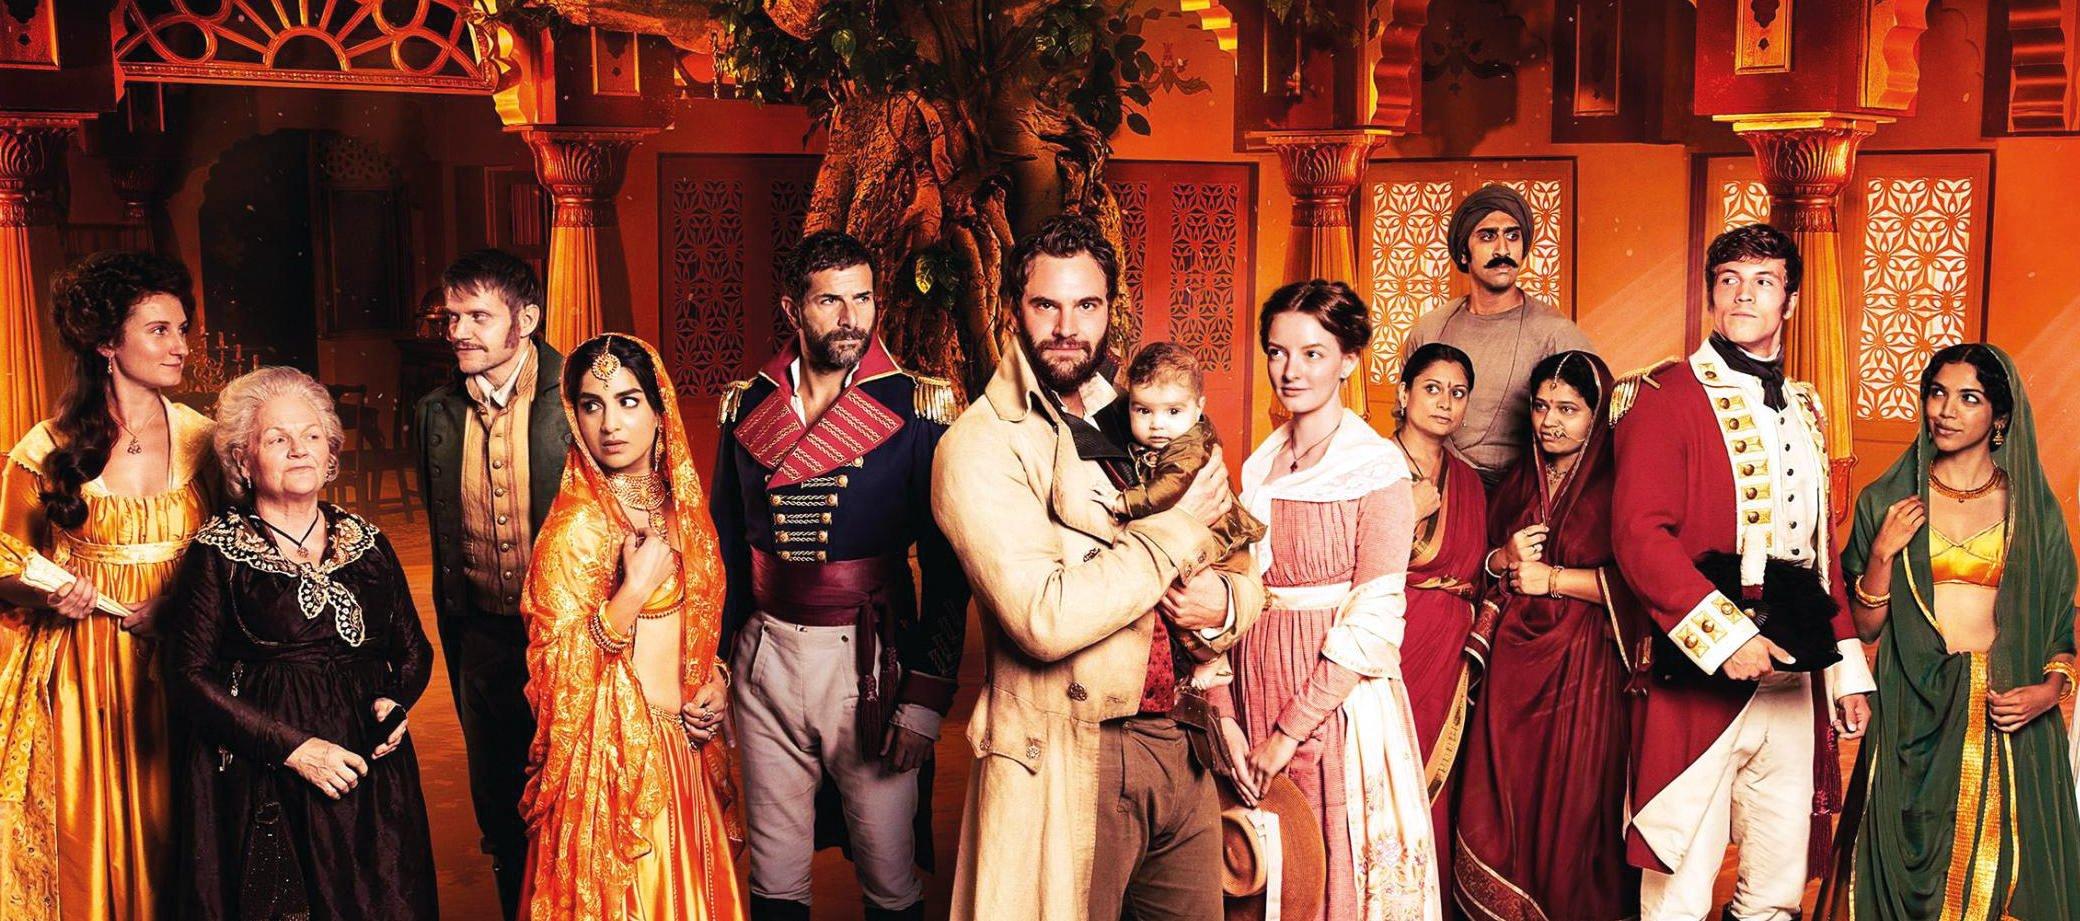 Netflix's Beecham House Review: A Woke White Orientalist's Dream